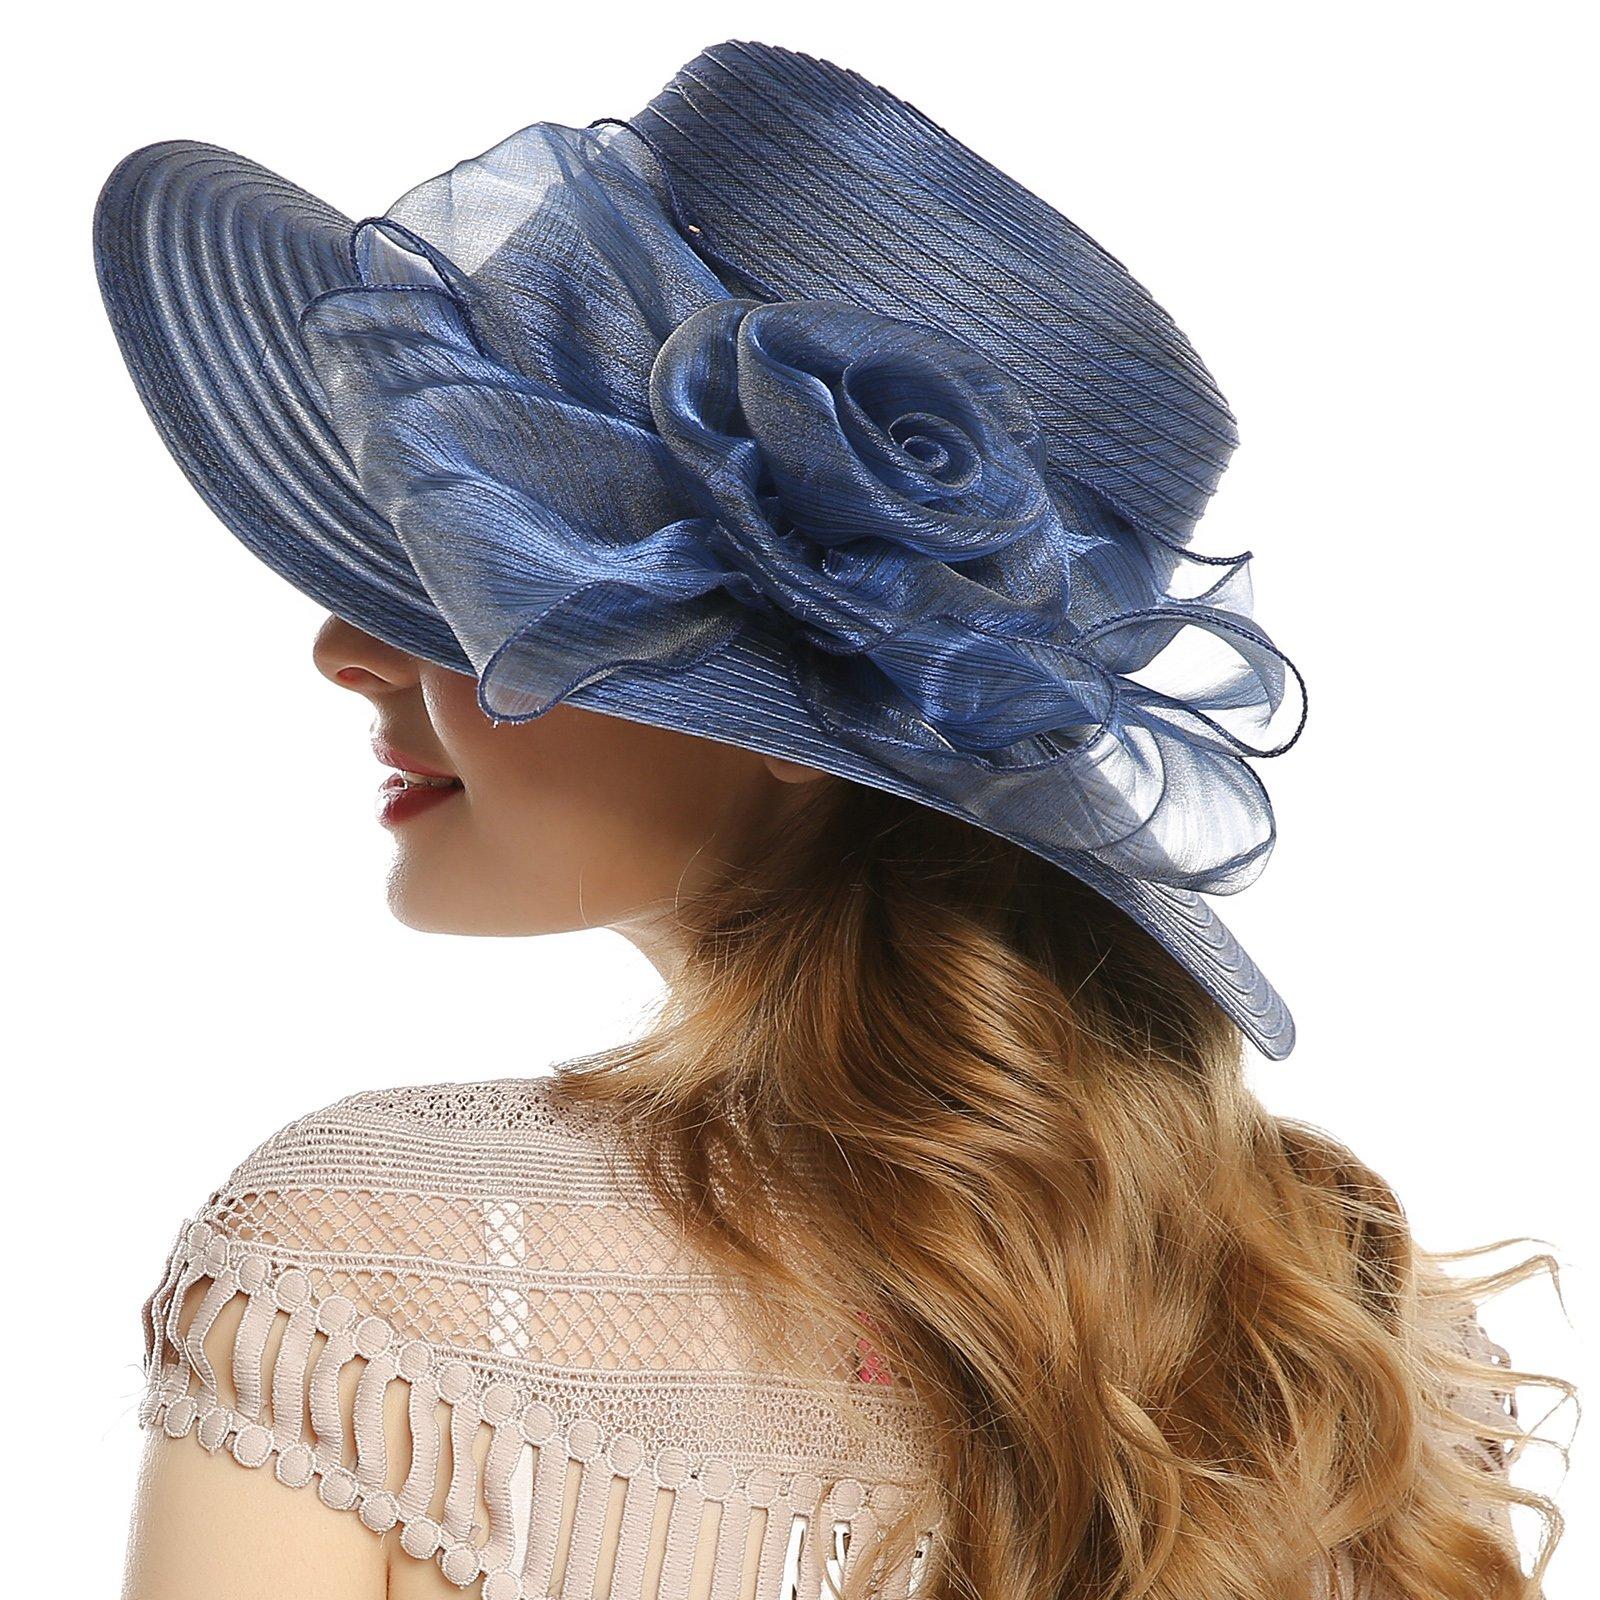 WELROG Women's Derby Church Dress Hat - Wide Brim Floppy Floral Ribbon UPF Protection Wedding Sun Hats(Navy Blue) by WELROG (Image #2)